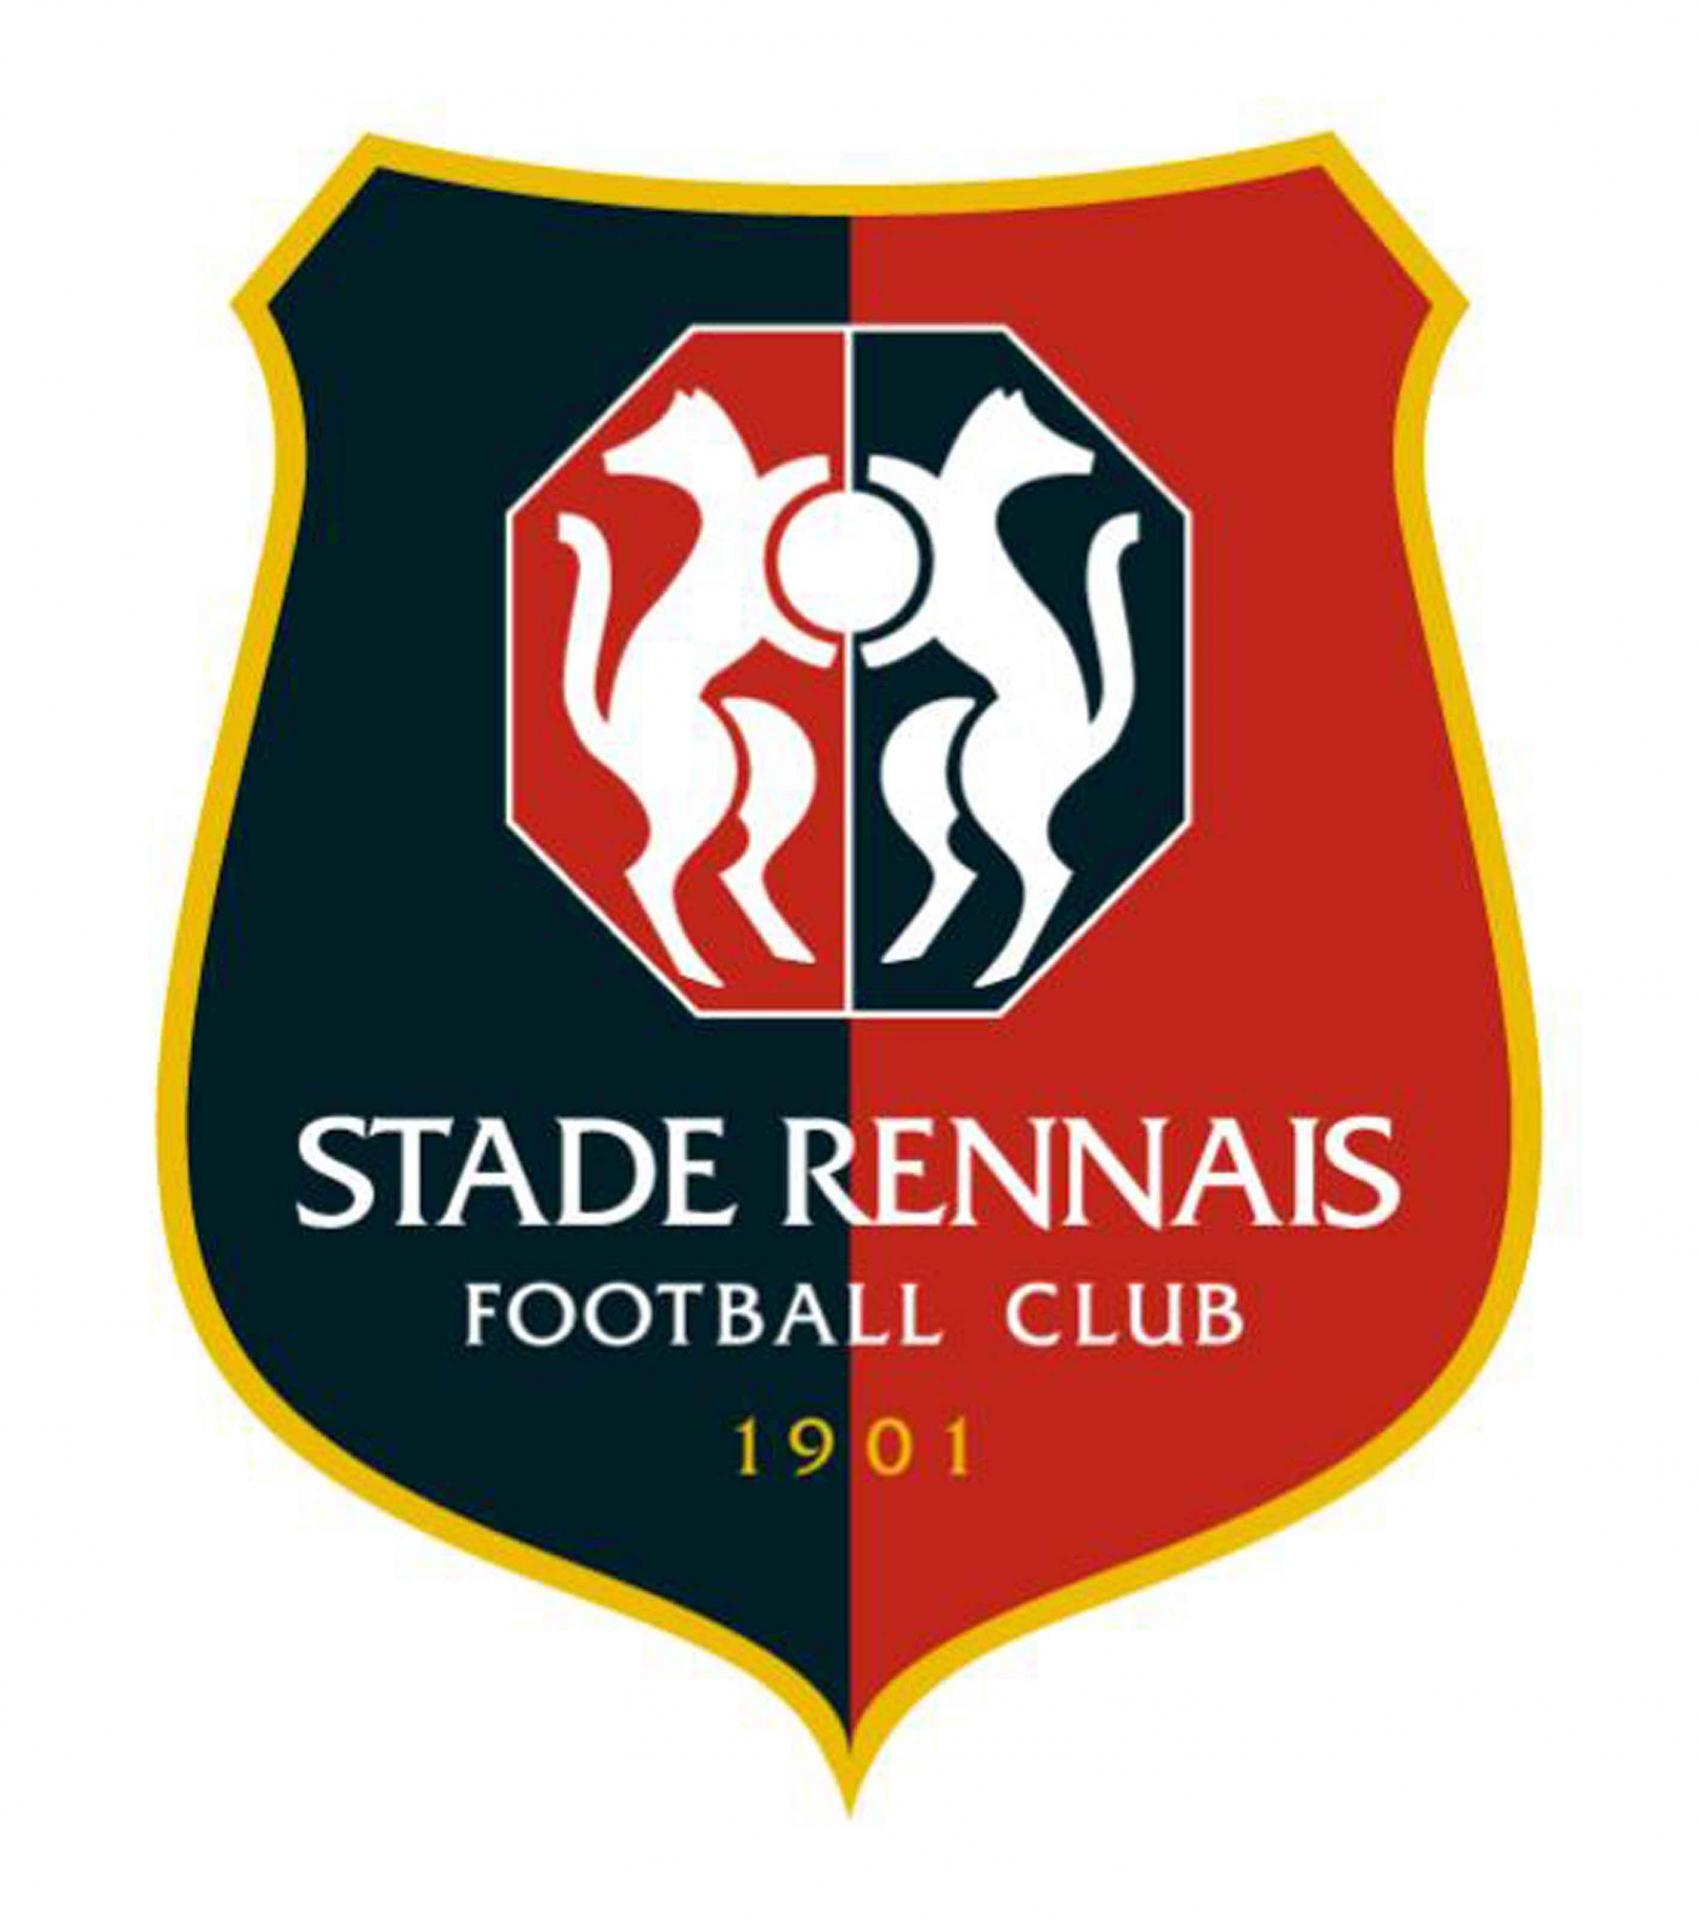 Logo stade rennais rennes 67664 wide